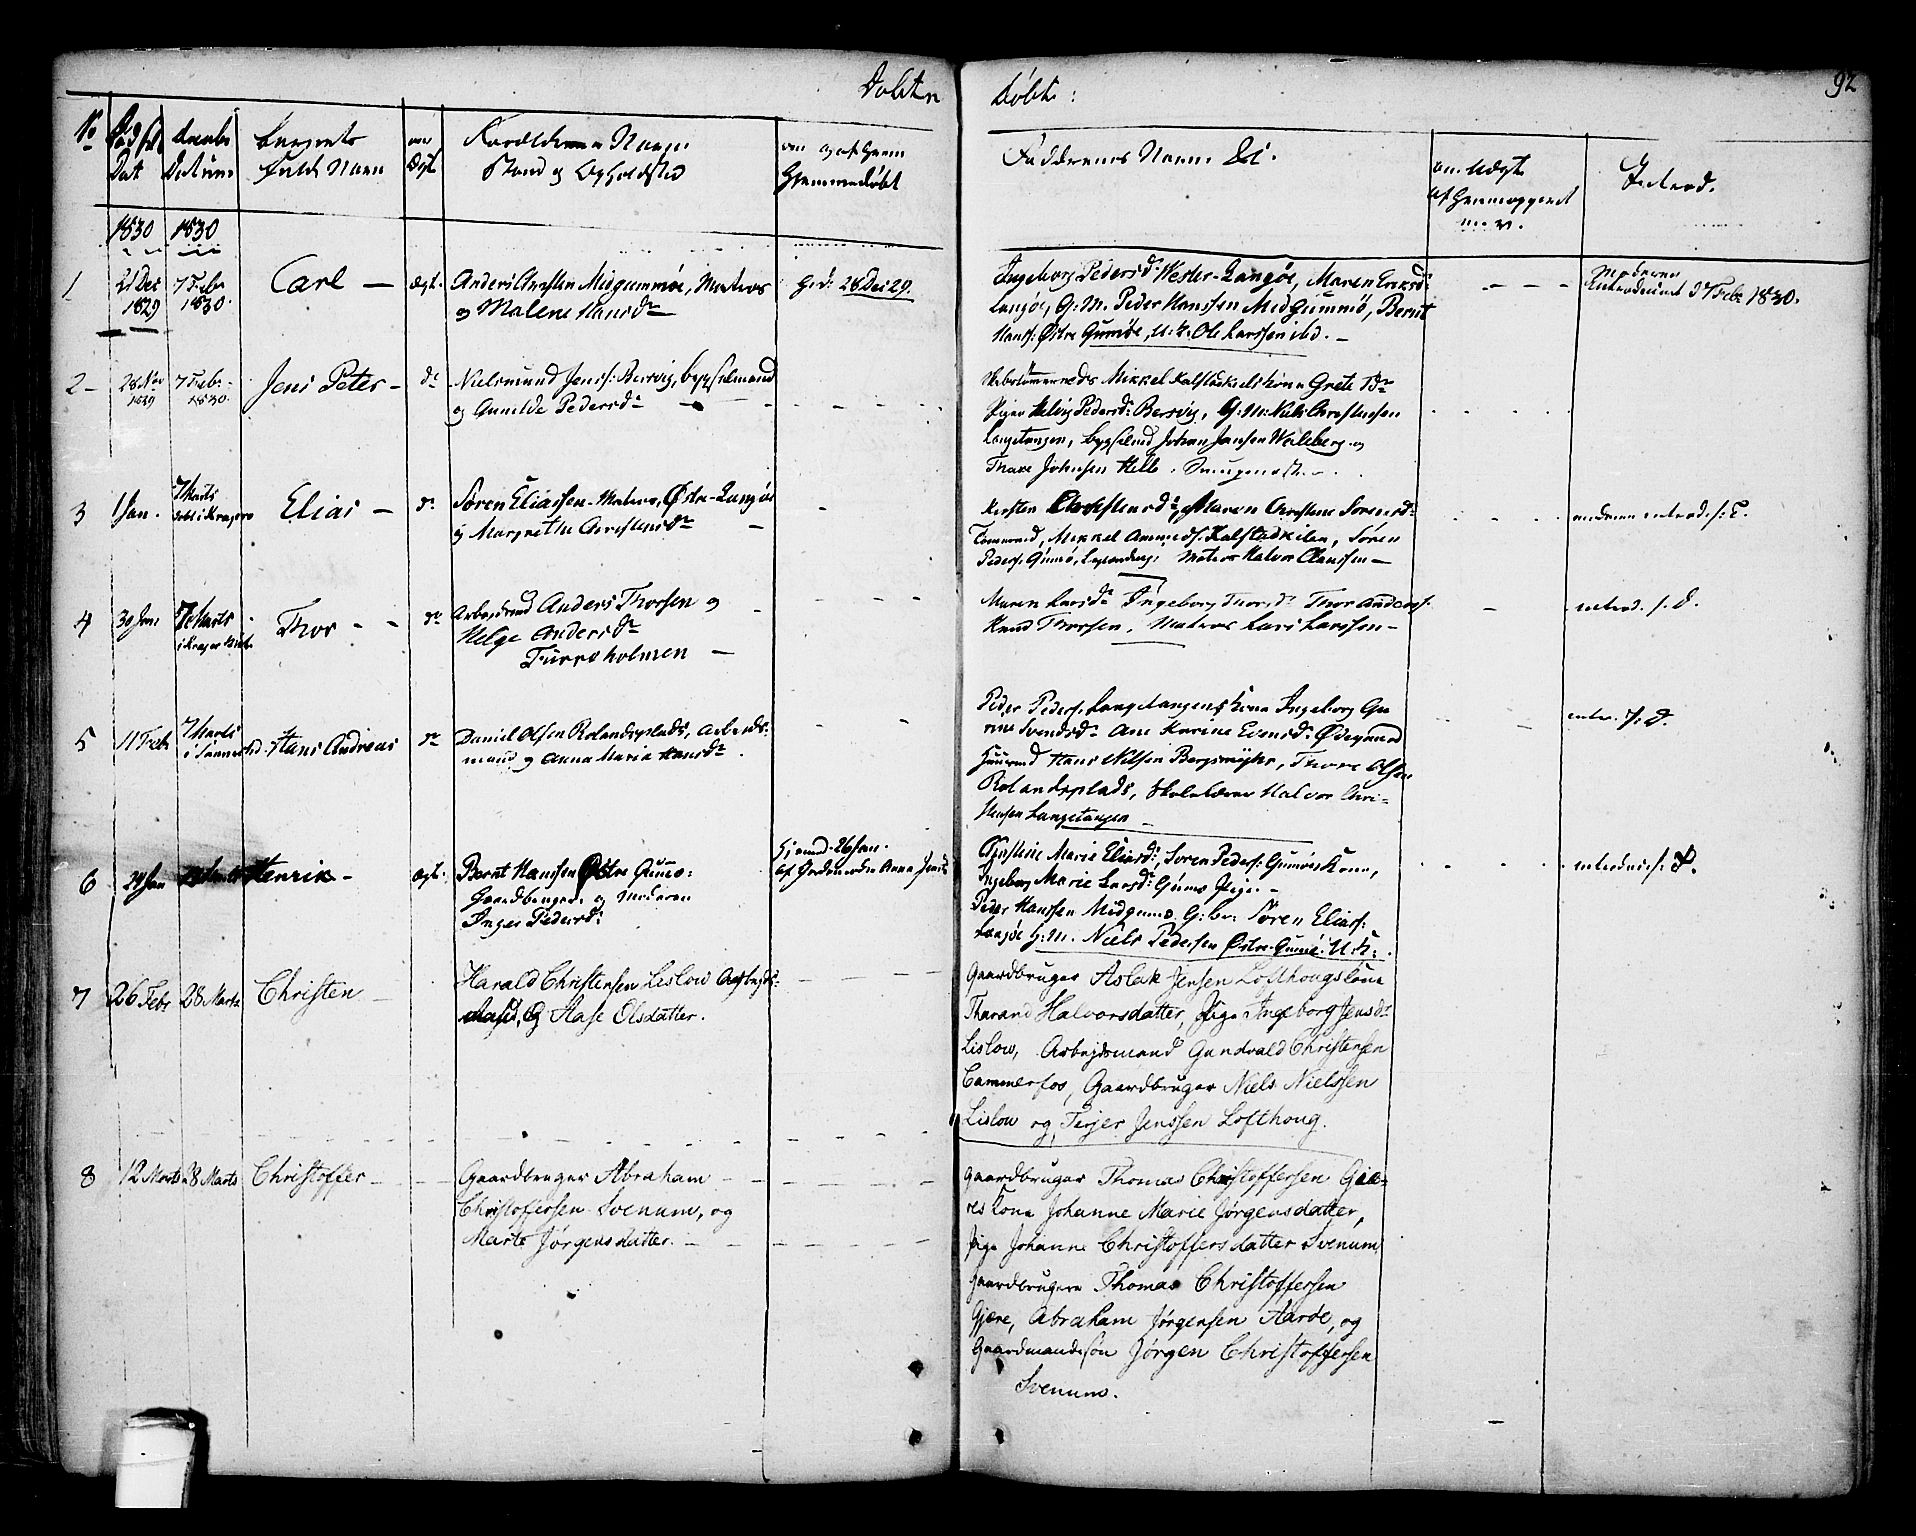 SAKO, Kragerø kirkebøker, F/Fa/L0002: Ministerialbok nr. 2, 1767-1802, s. 92